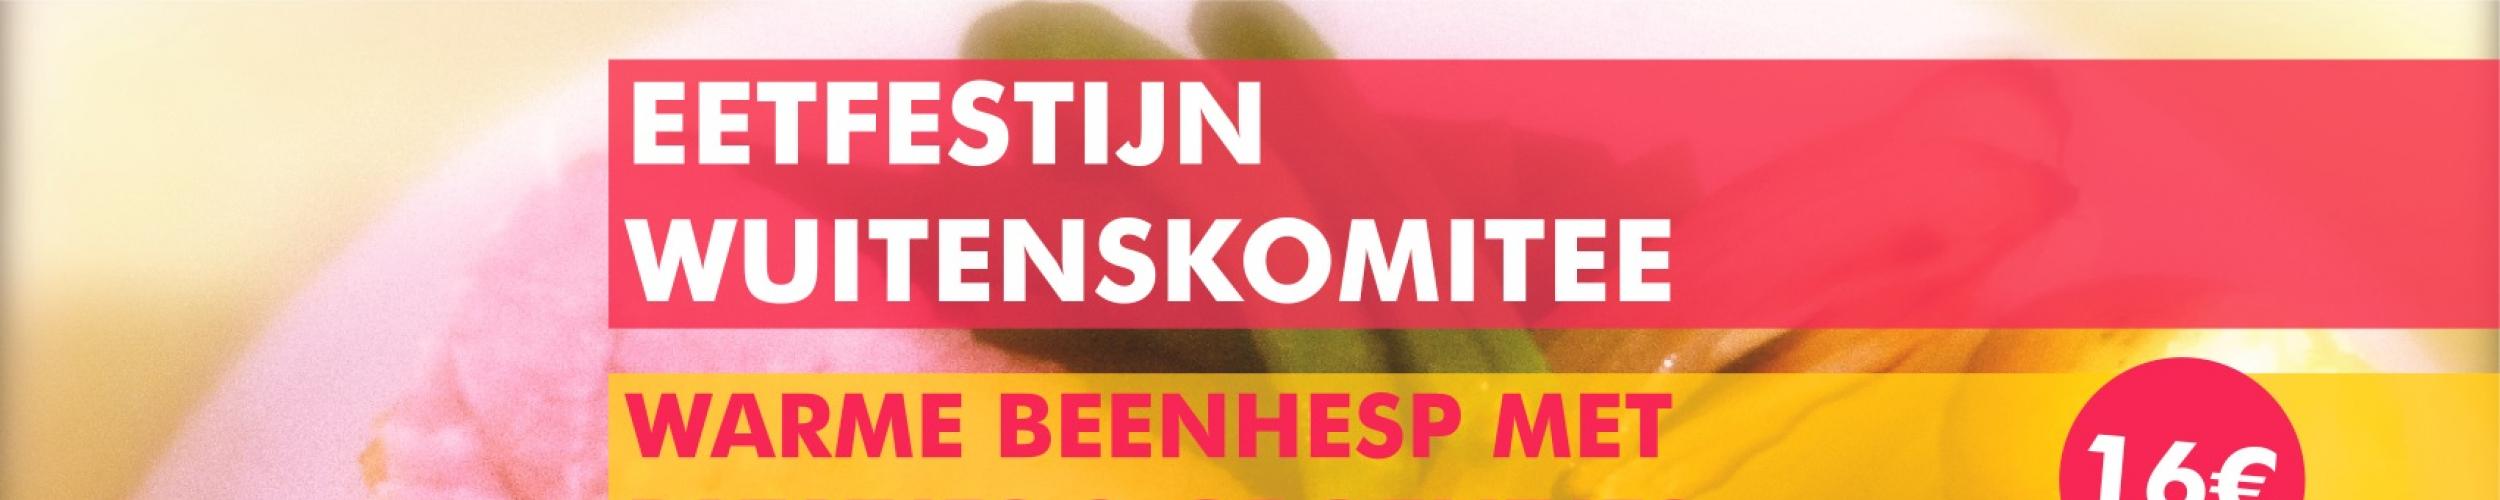 Eetfestijn Wuitenskomitee 2018